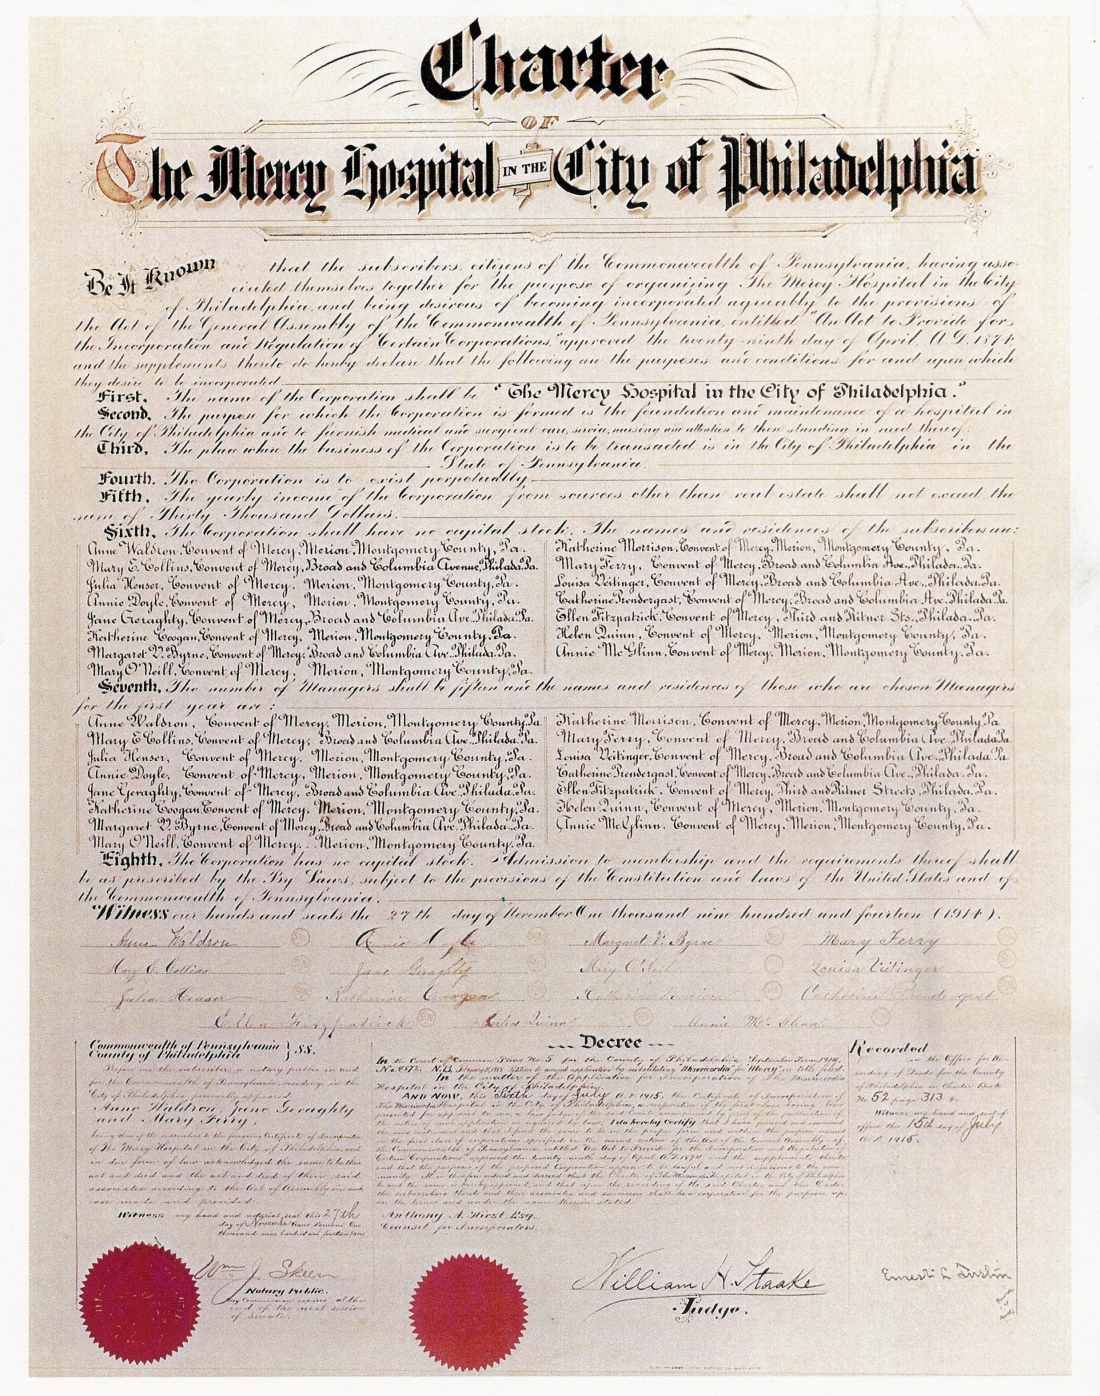 4 hospital charter copy